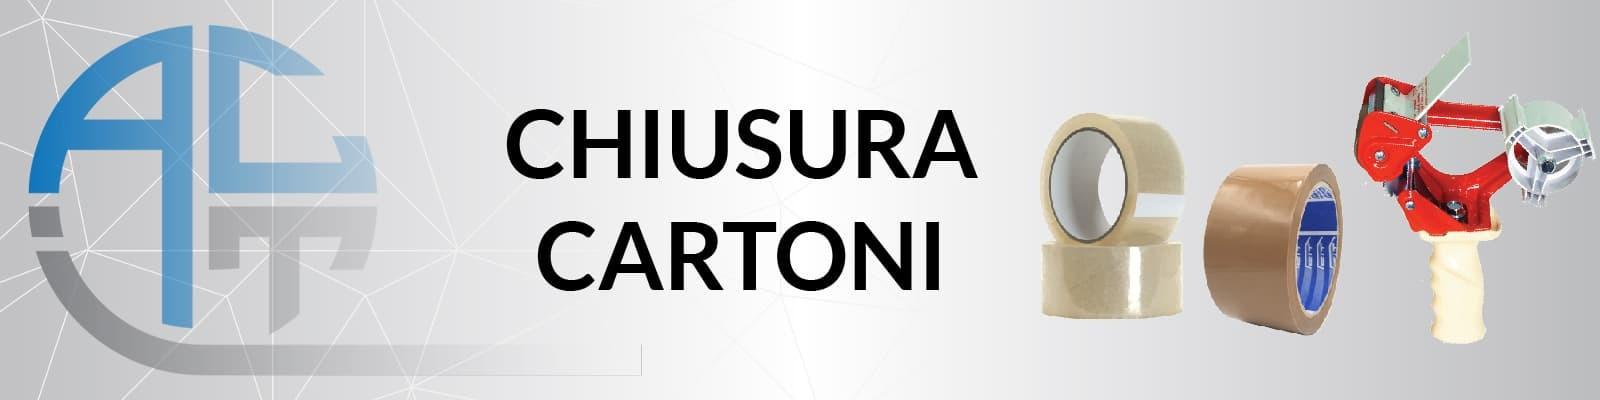 Nastri Chiusura Cartoni